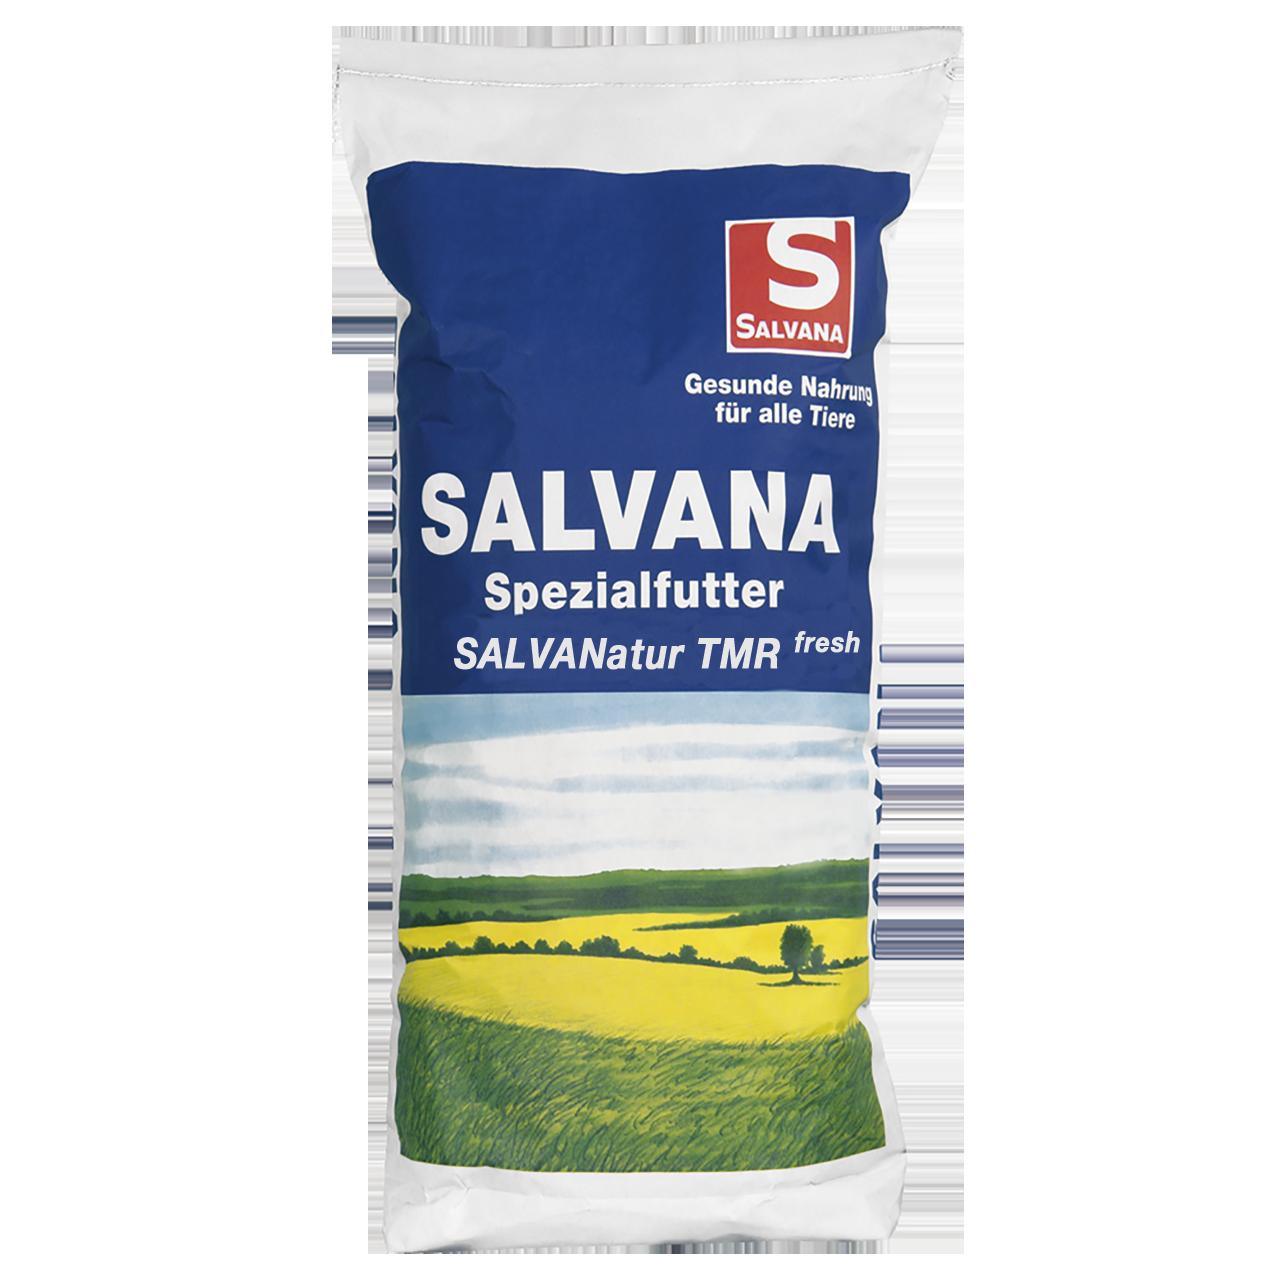 SALVANatur TMR fresh